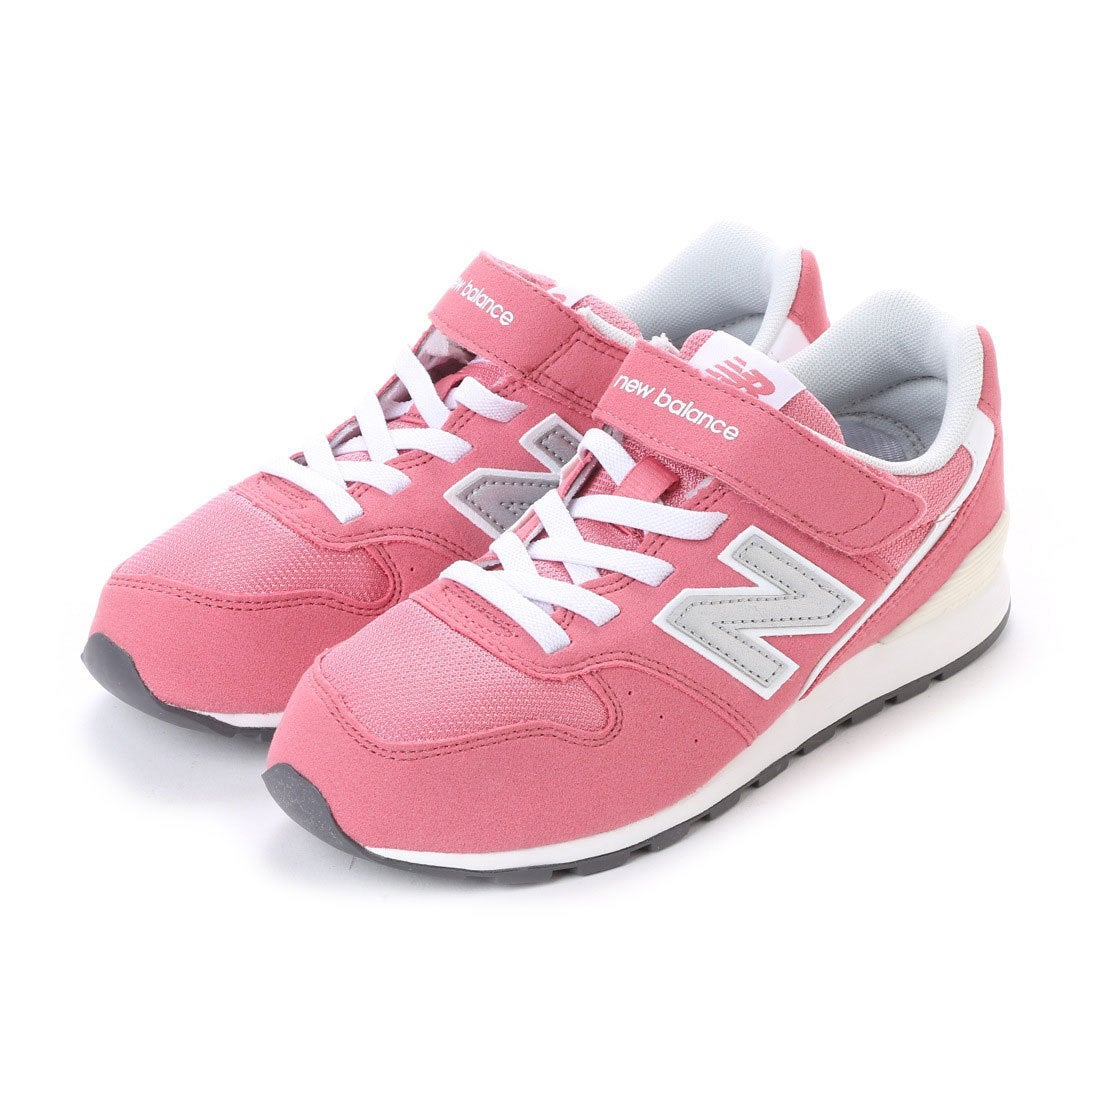 1b8b3a0257c13 ニューバランス new balance NB KV996 CIY (ピンク) -靴&ファッション通販 ロコンド〜自宅で試着、気軽に返品